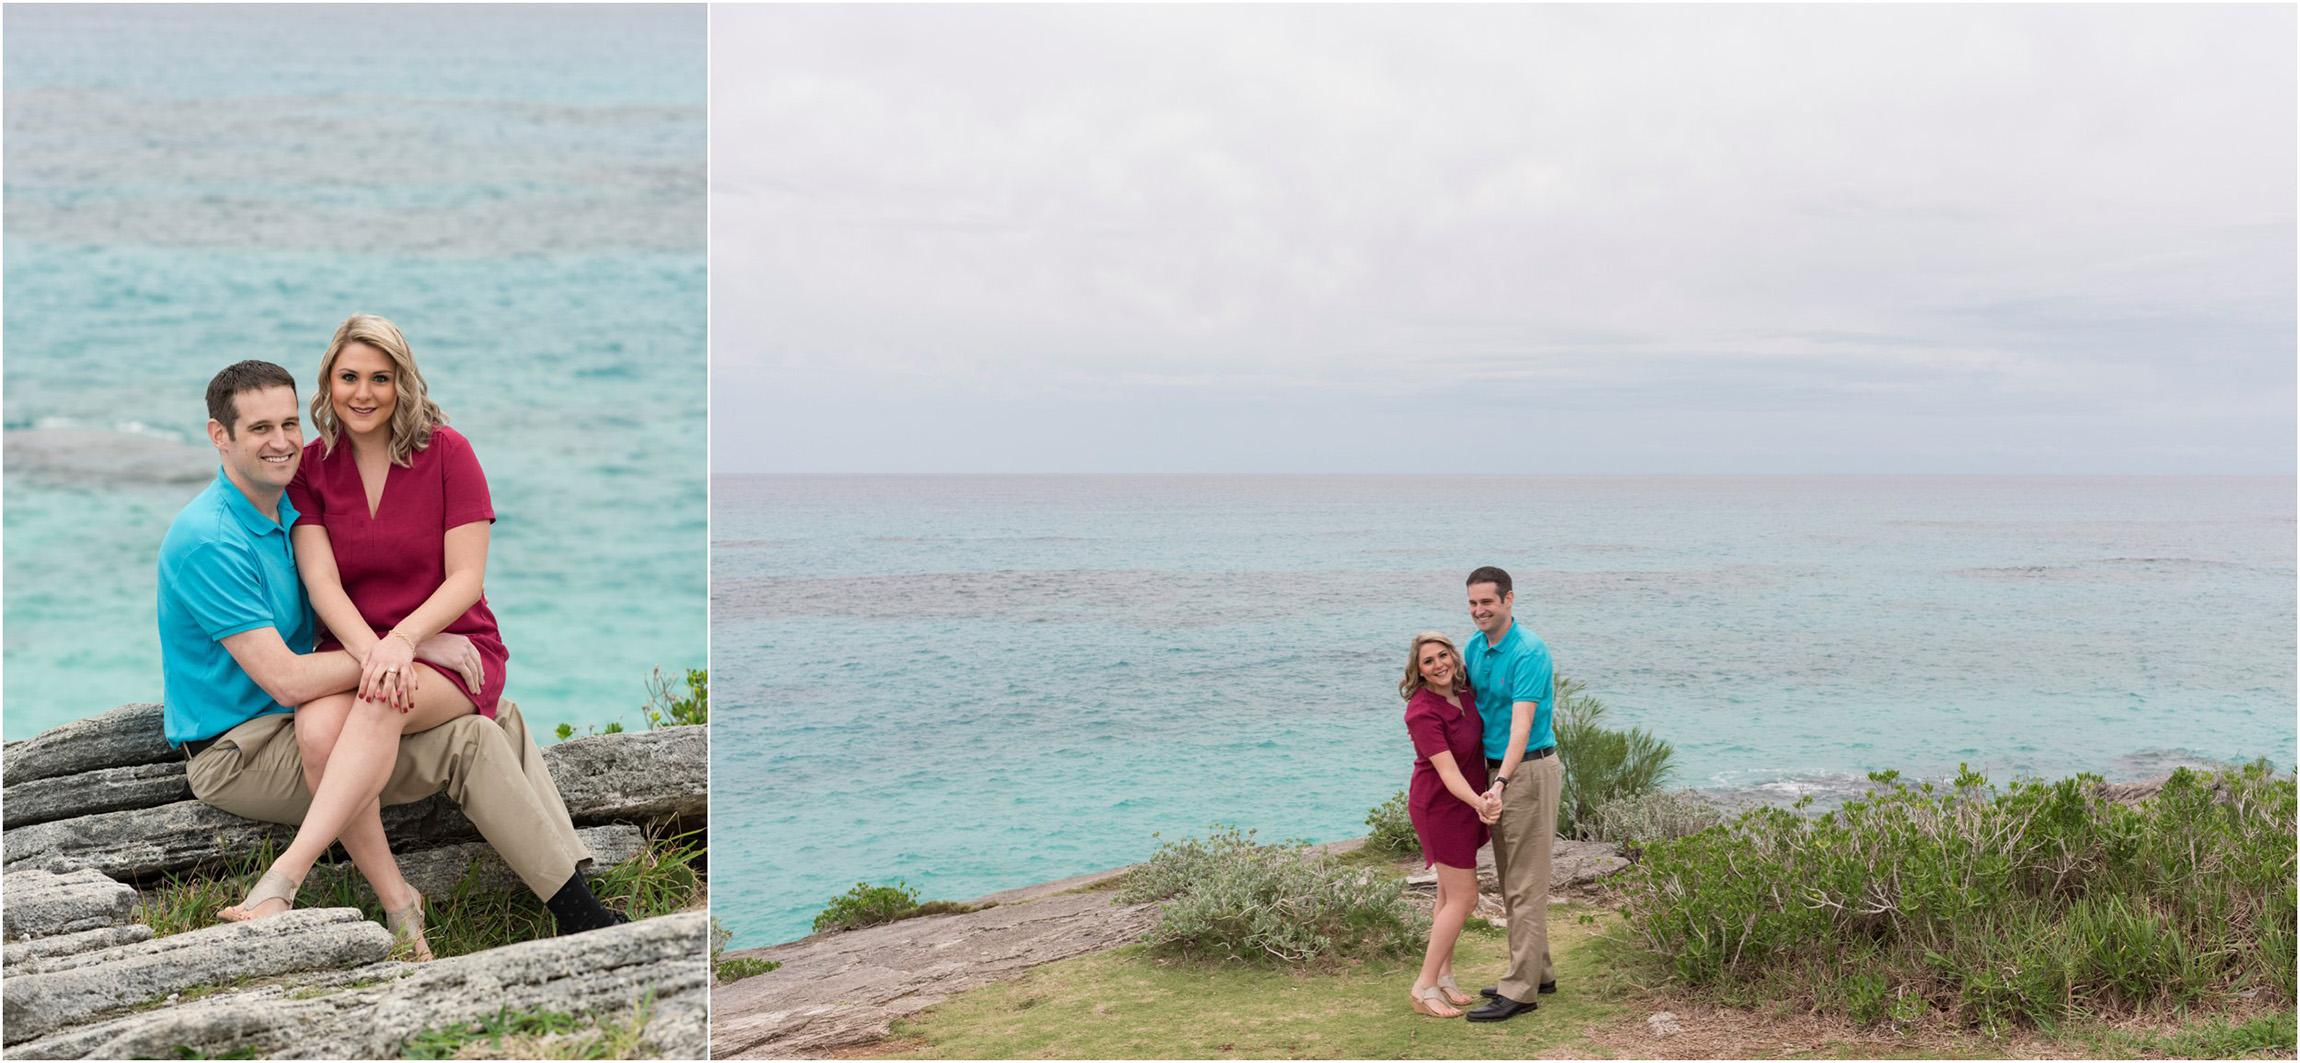 ©FianderFoto_Bermuda Photographer_Astwood Park_Vanessa_Kevin_002.jpg